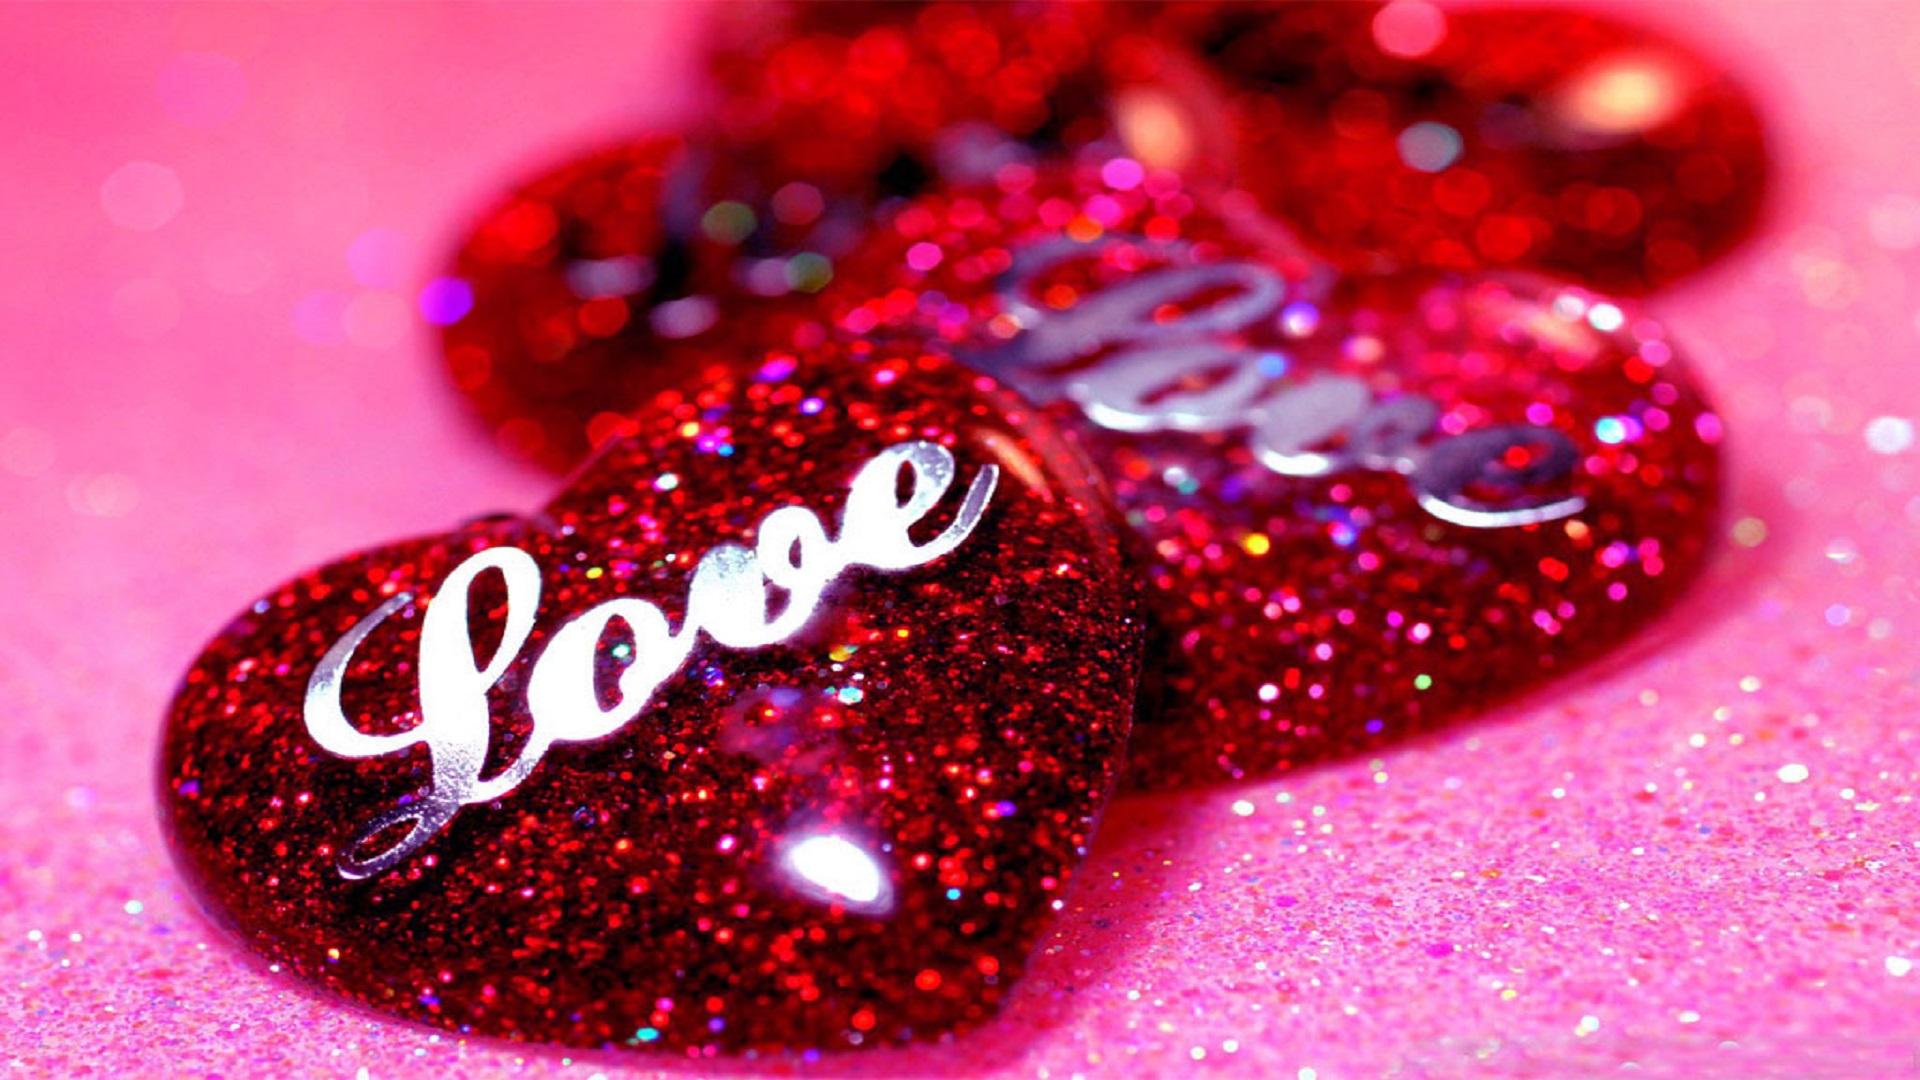 Beautiful Romantic Red Heart Hd Wallpaper Free